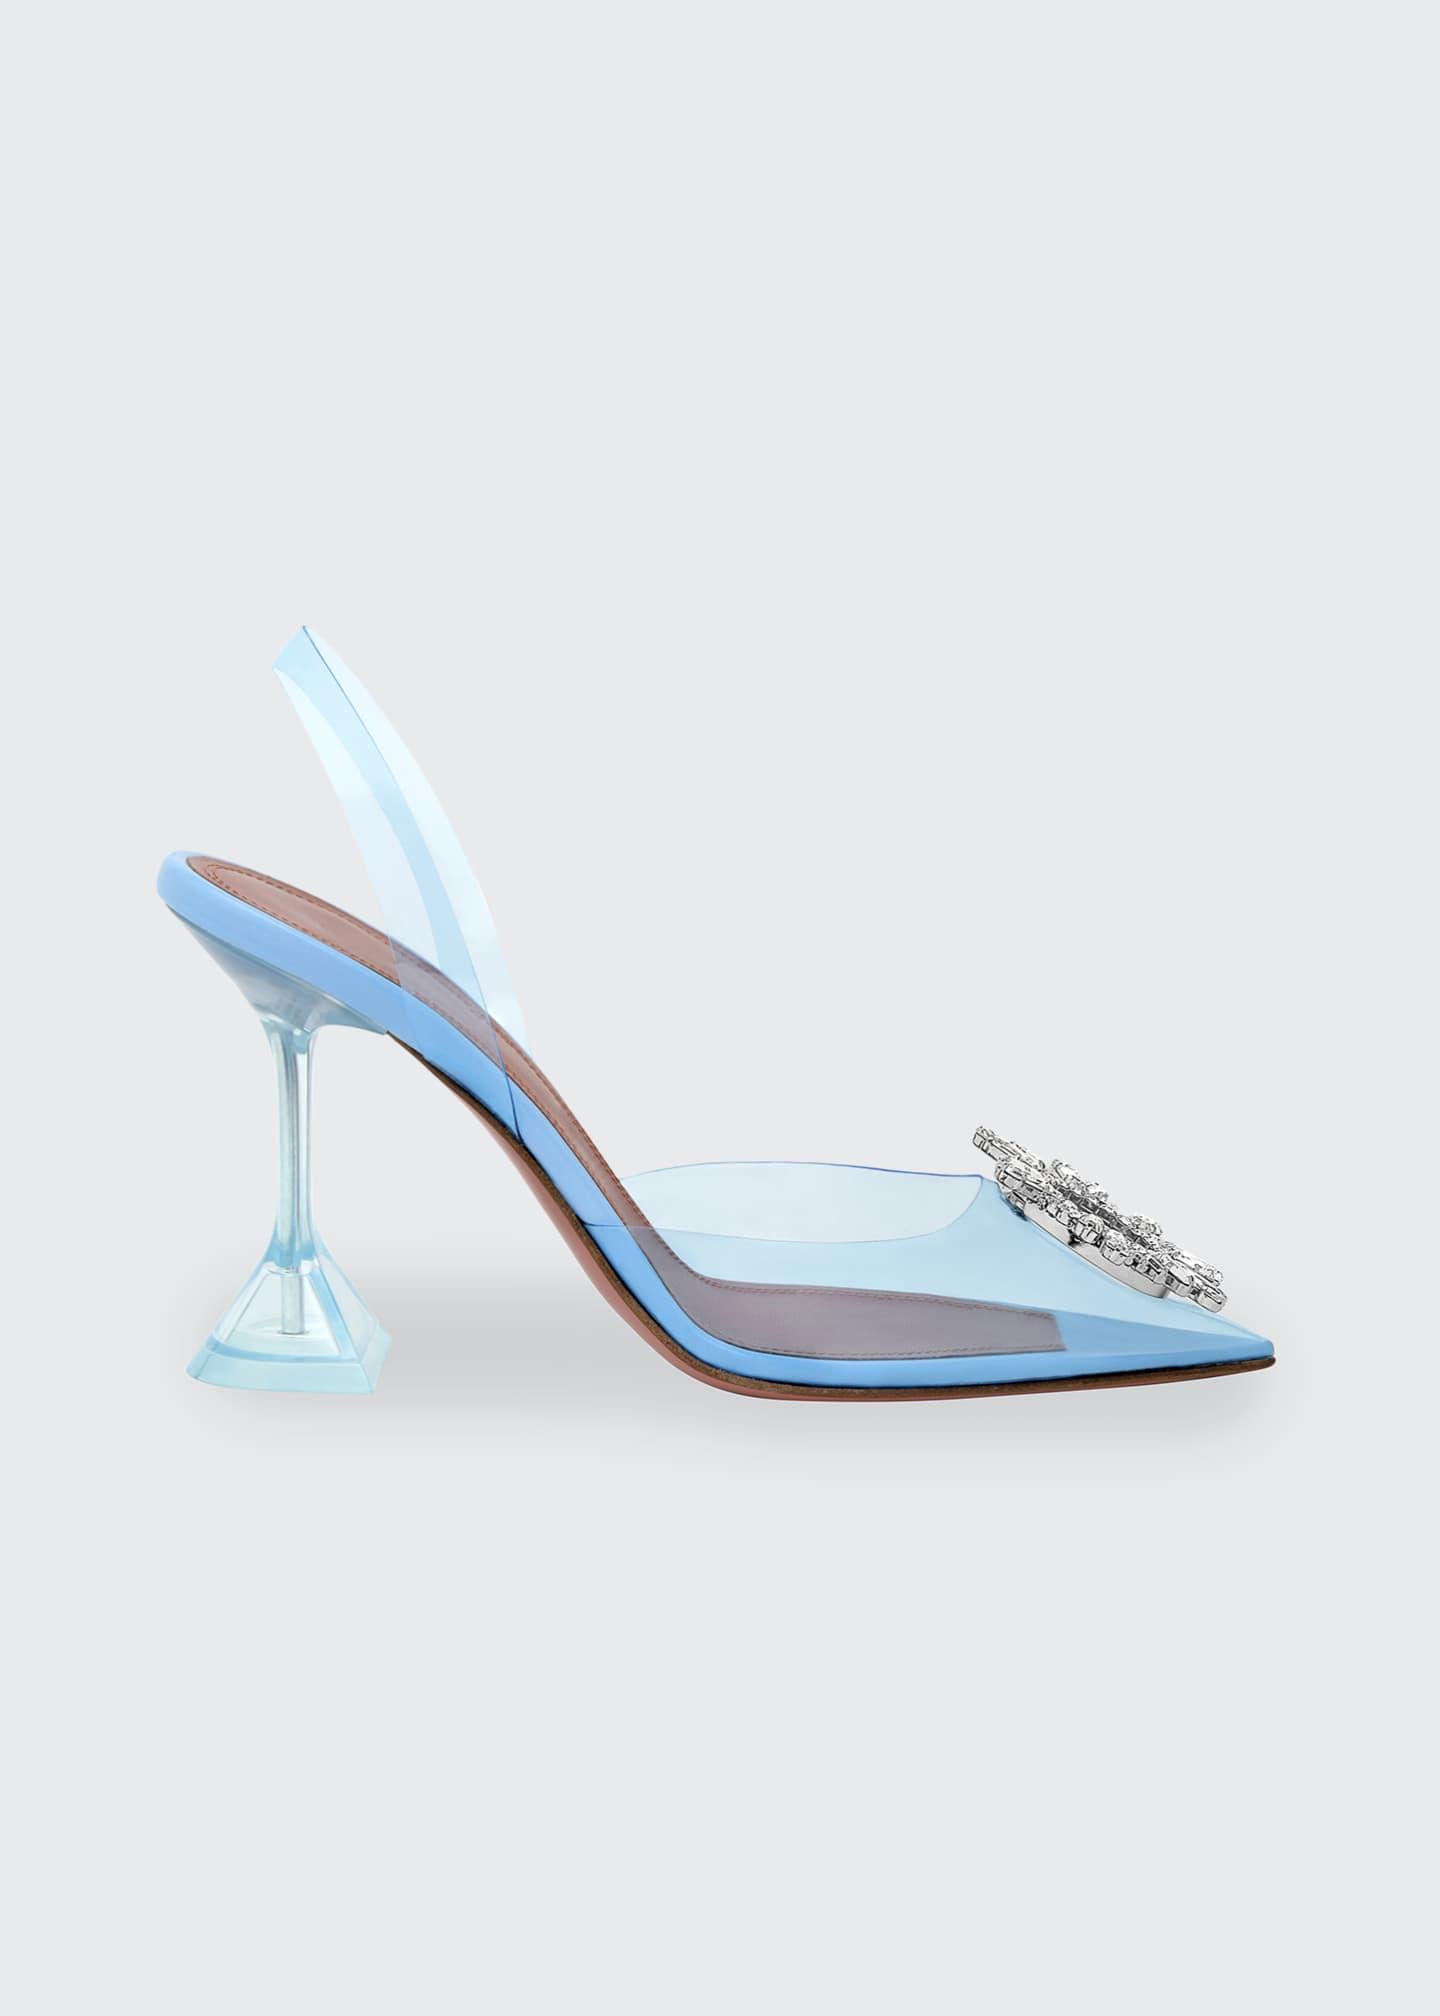 Amina Muaddi Begum Glass Transparent Sandals